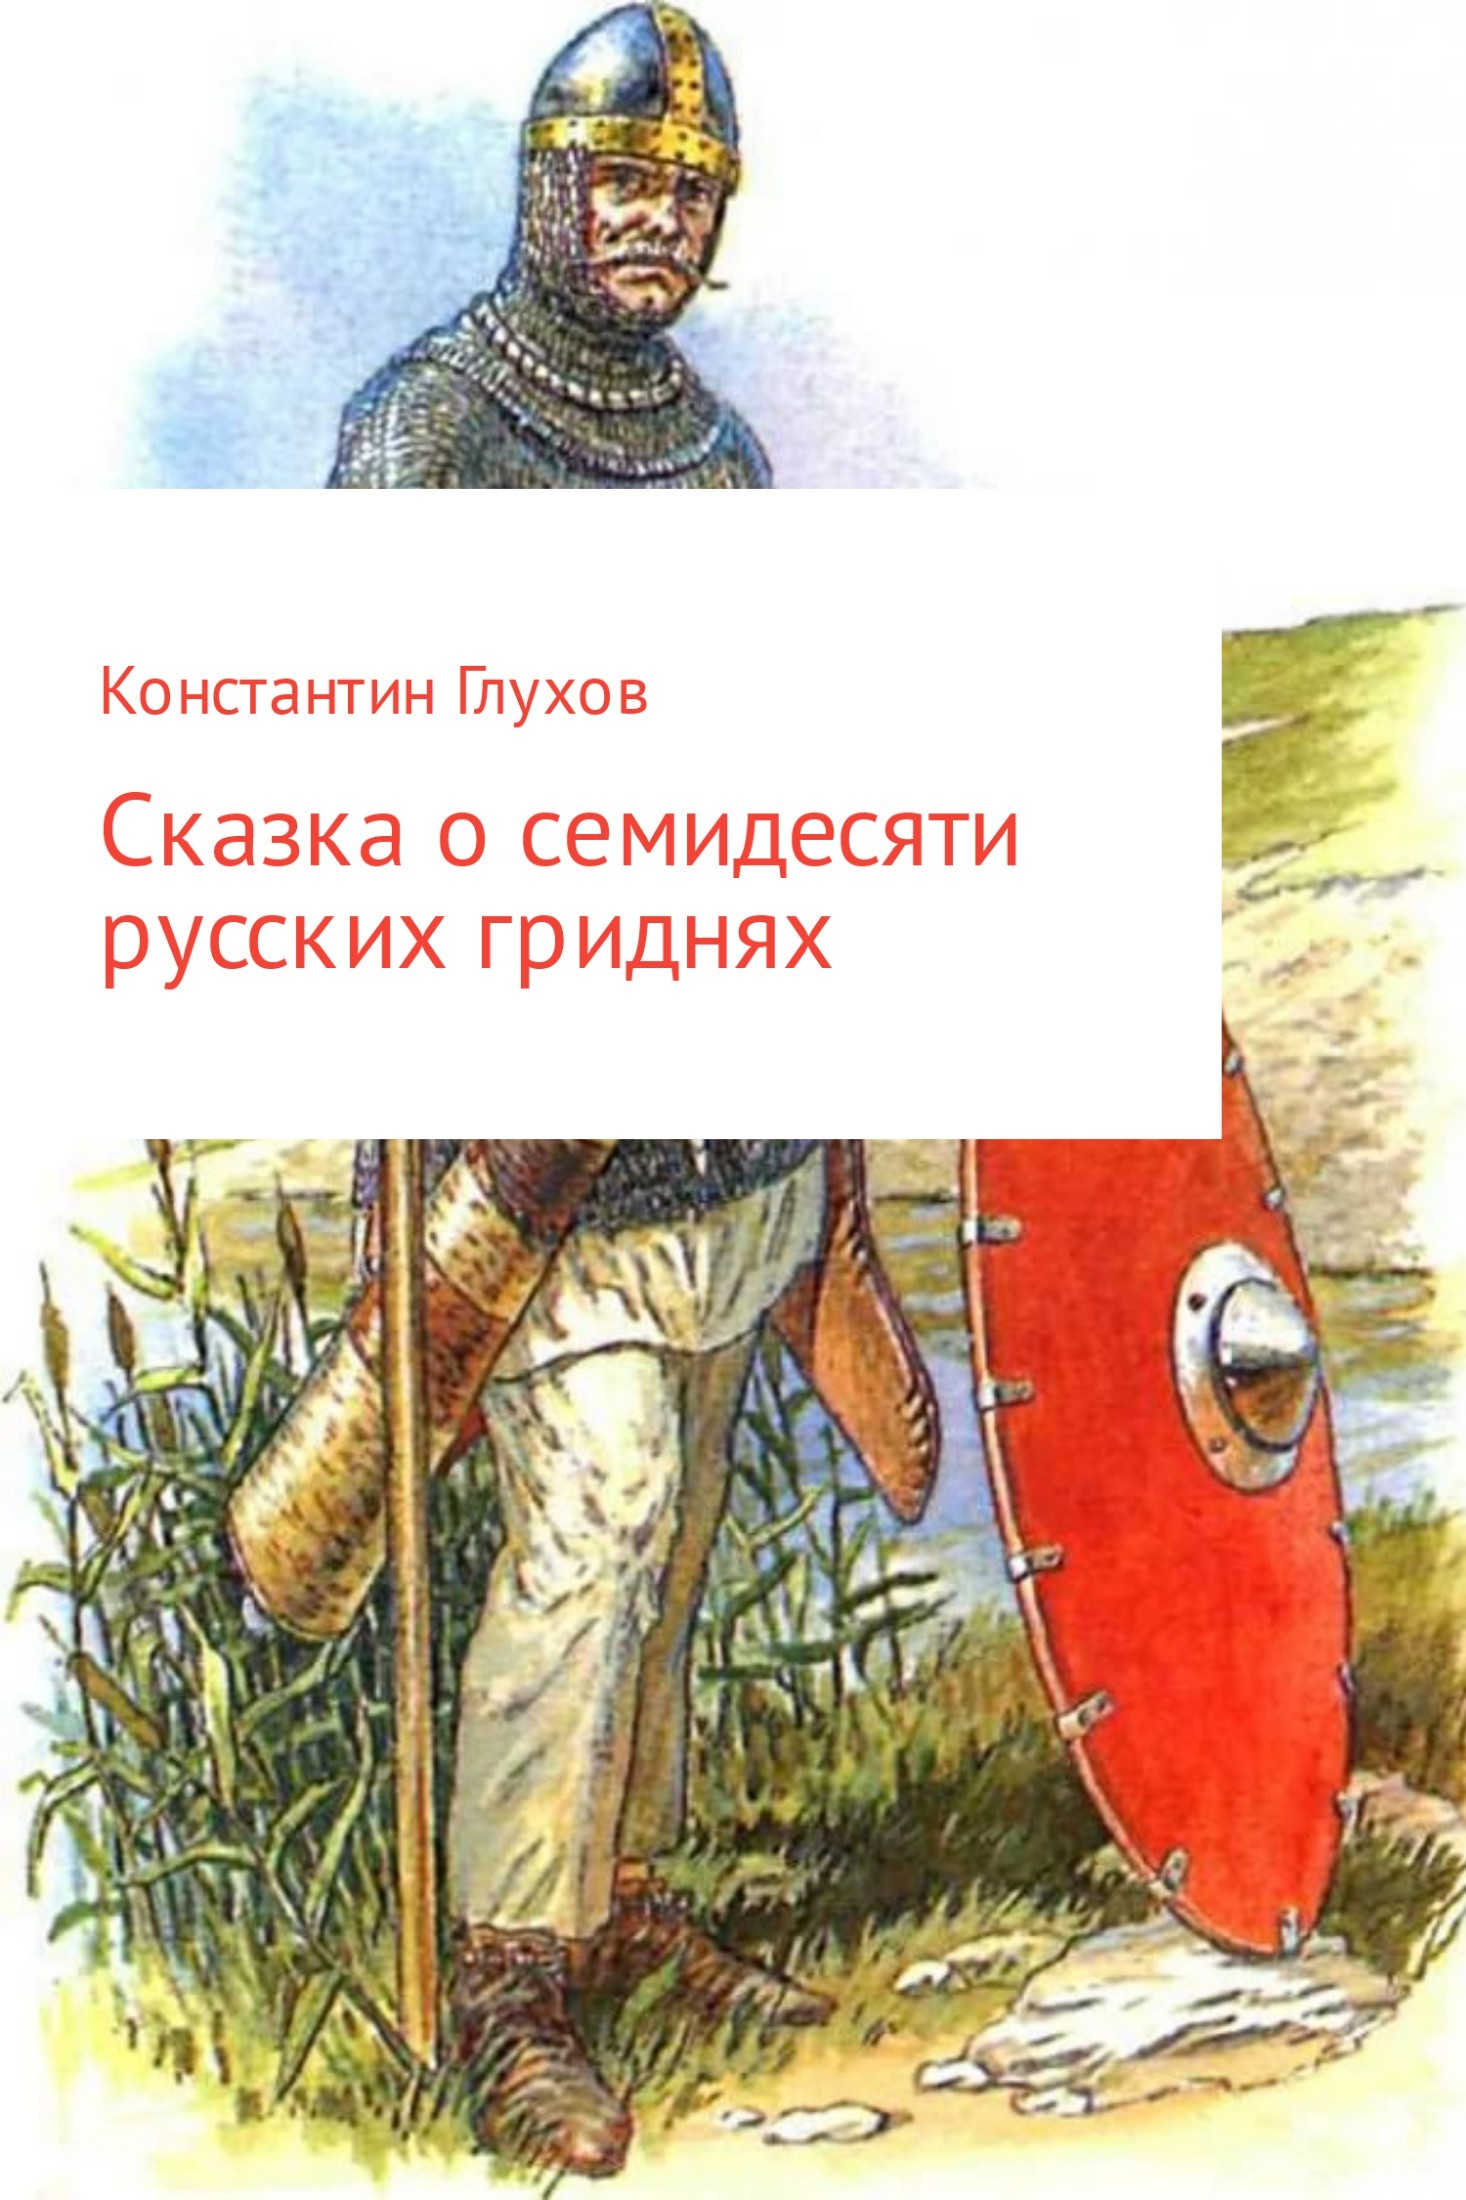 Константин Глухов - Сказка о семидесяти русских гриднях